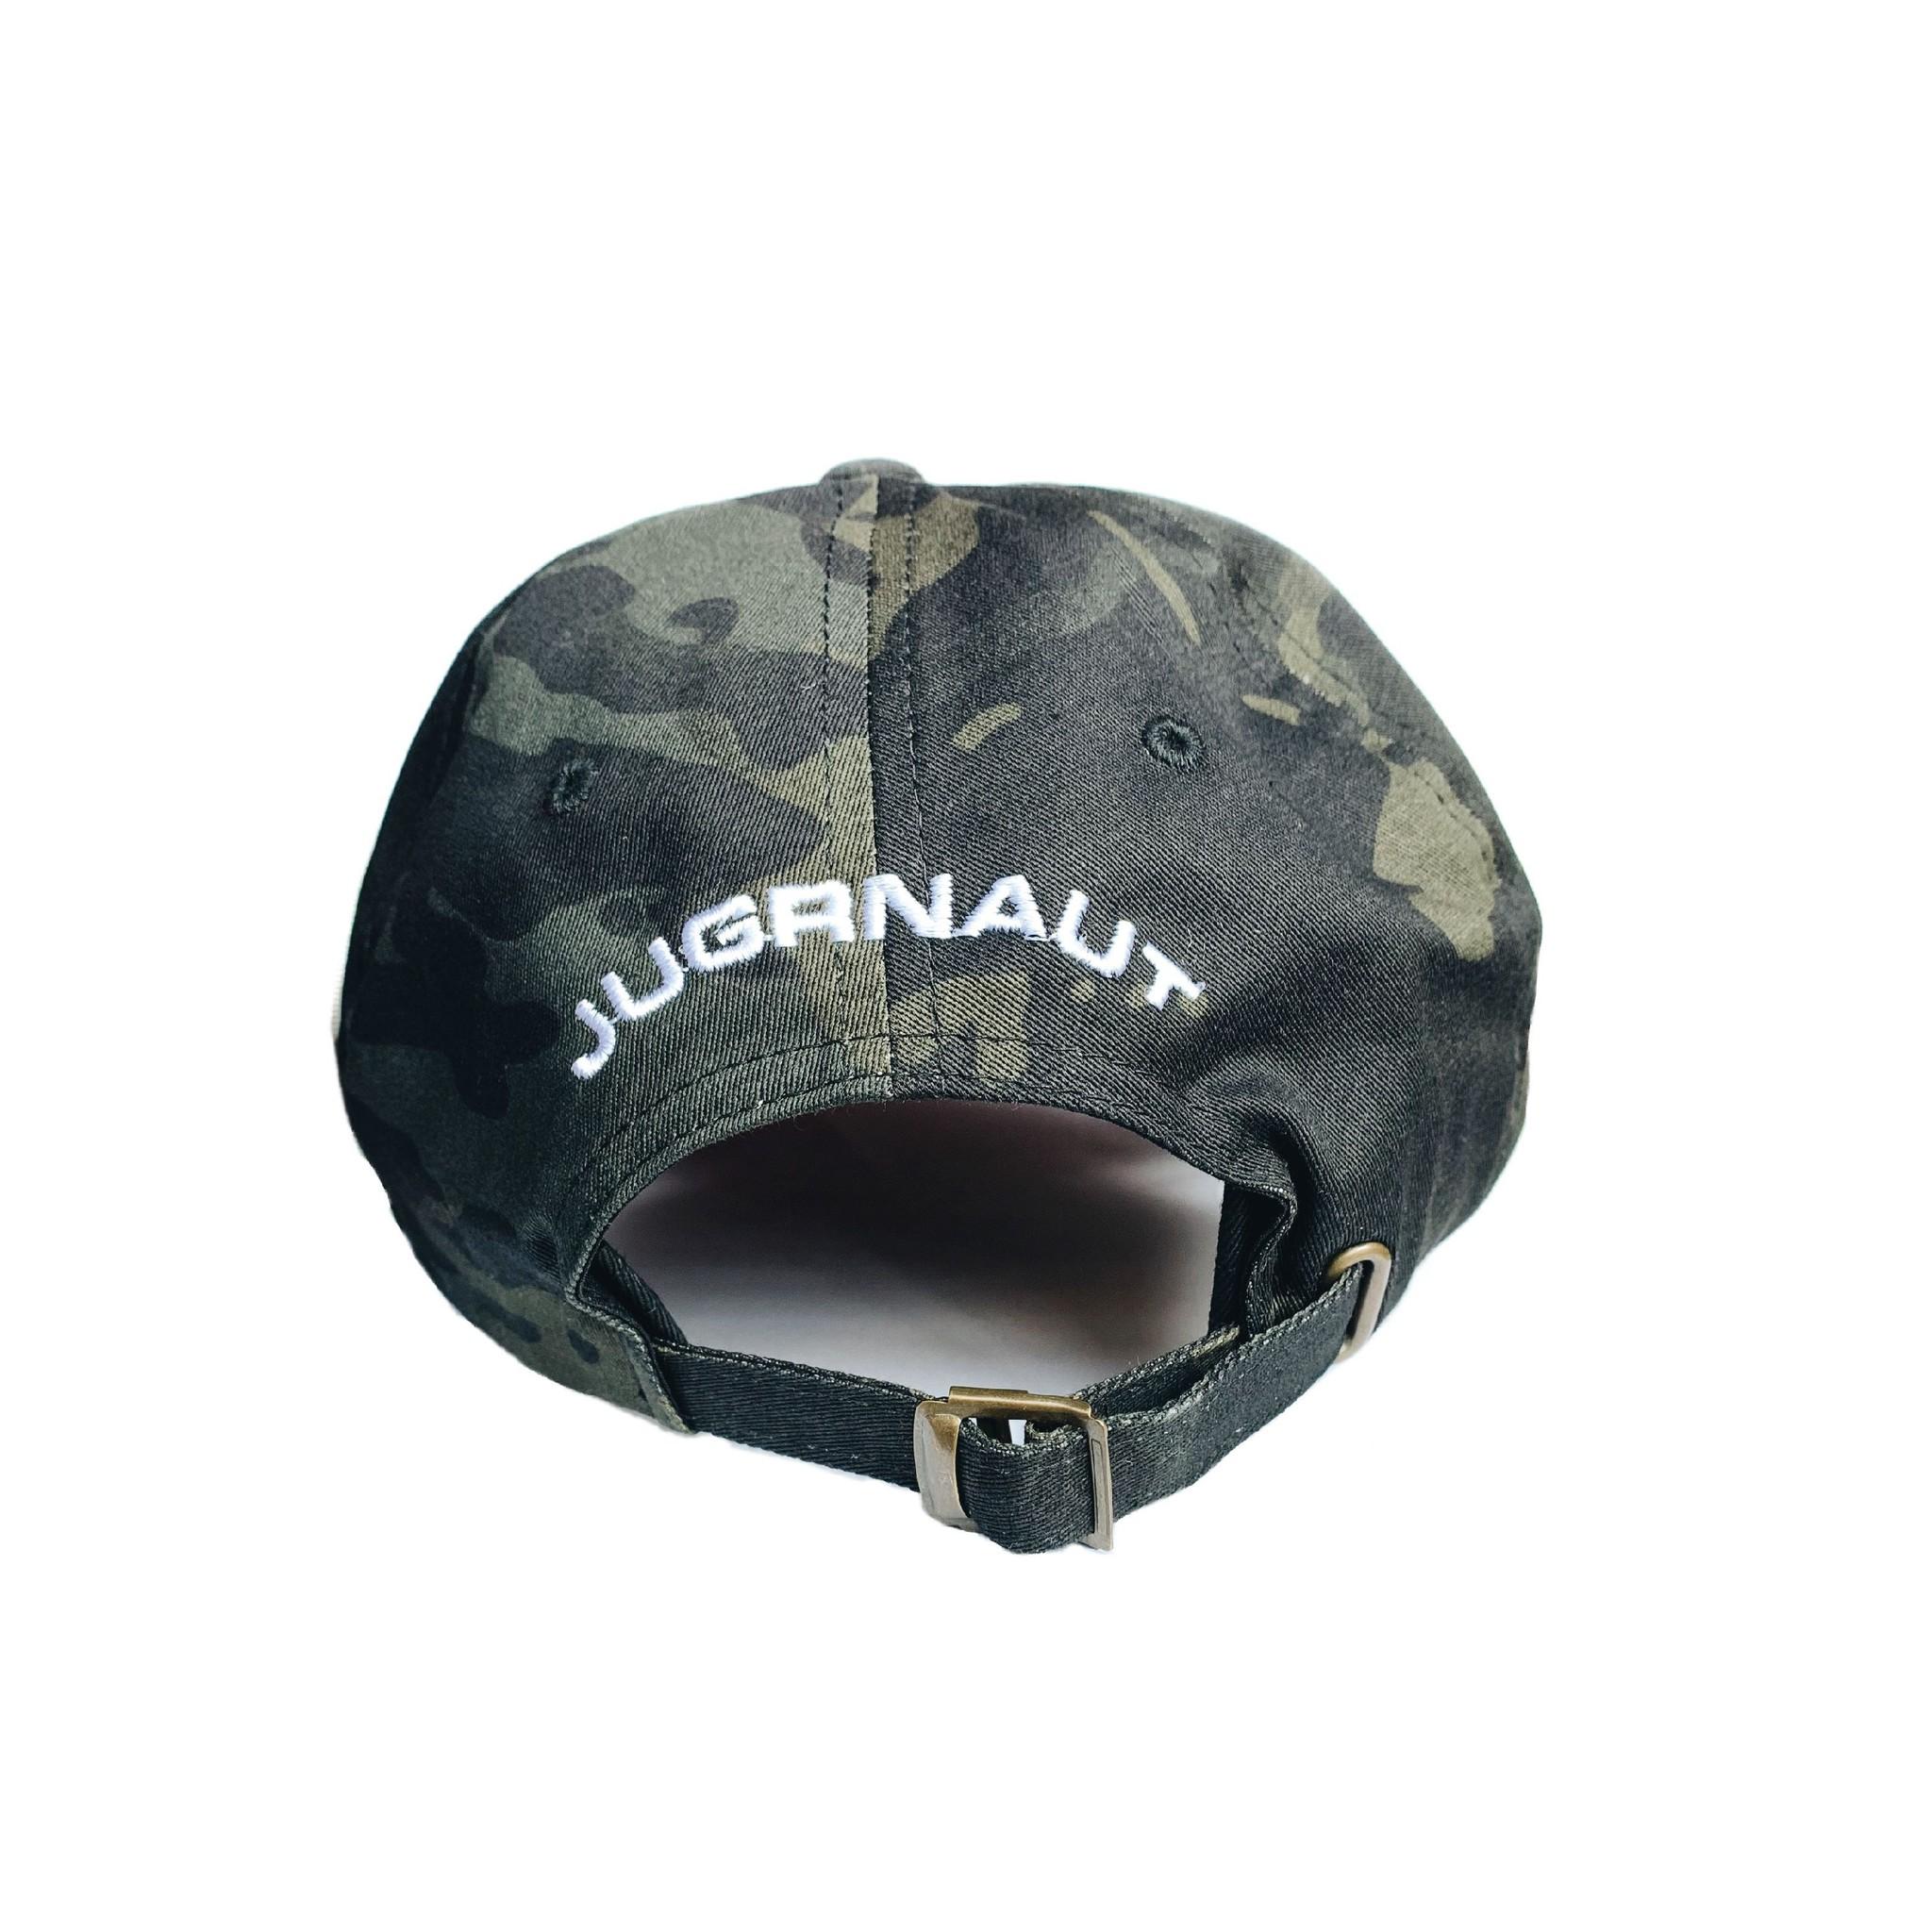 Jugrnaut Jugrnaut Sportsman Shield Cap Multi Camo